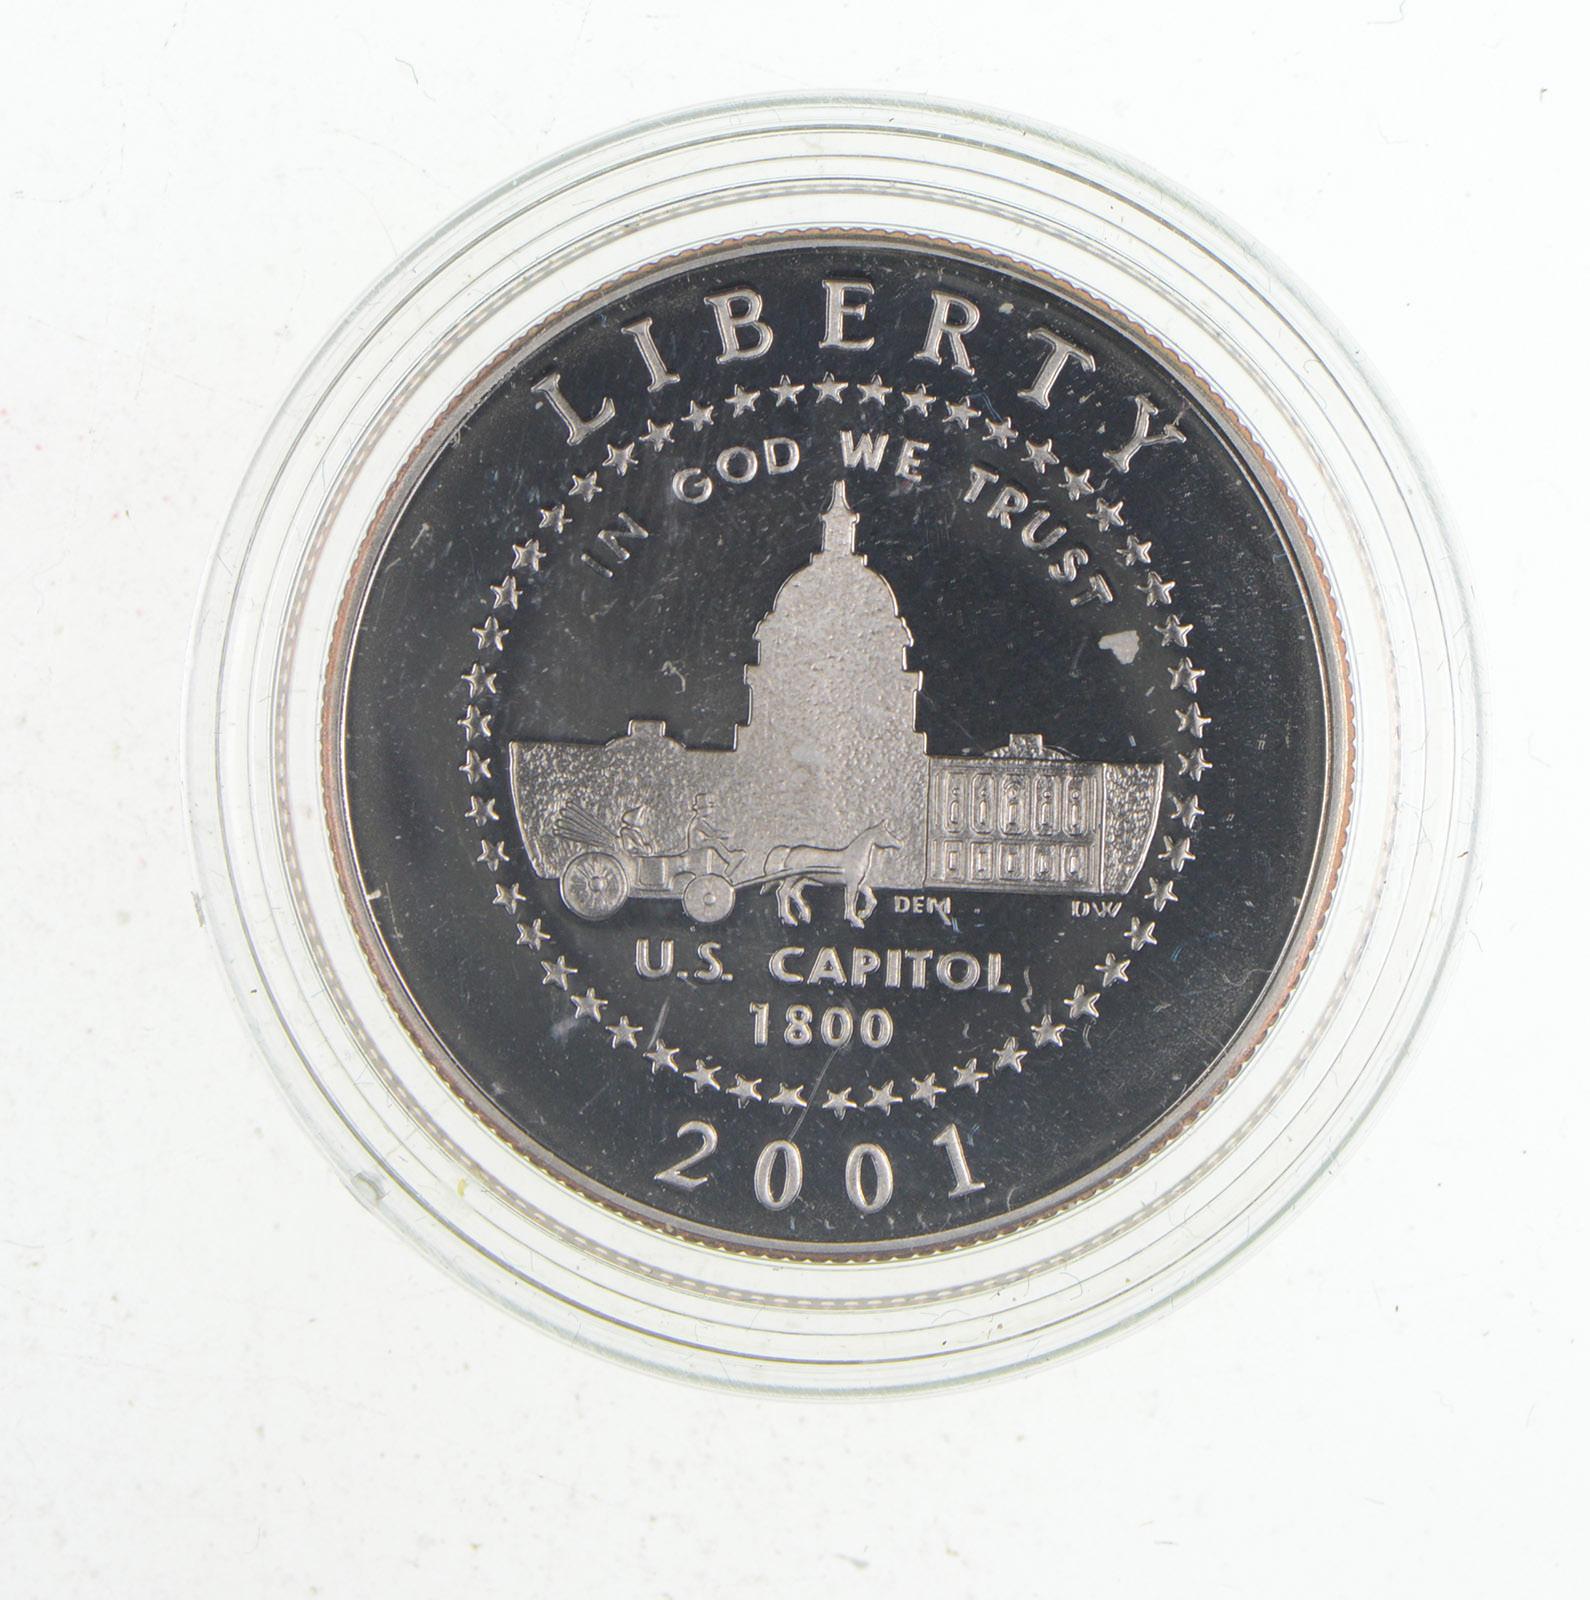 2001-P Capitol Visitor Center Silver Commemorative Dollar PR69DCAM PCGS Proof 69